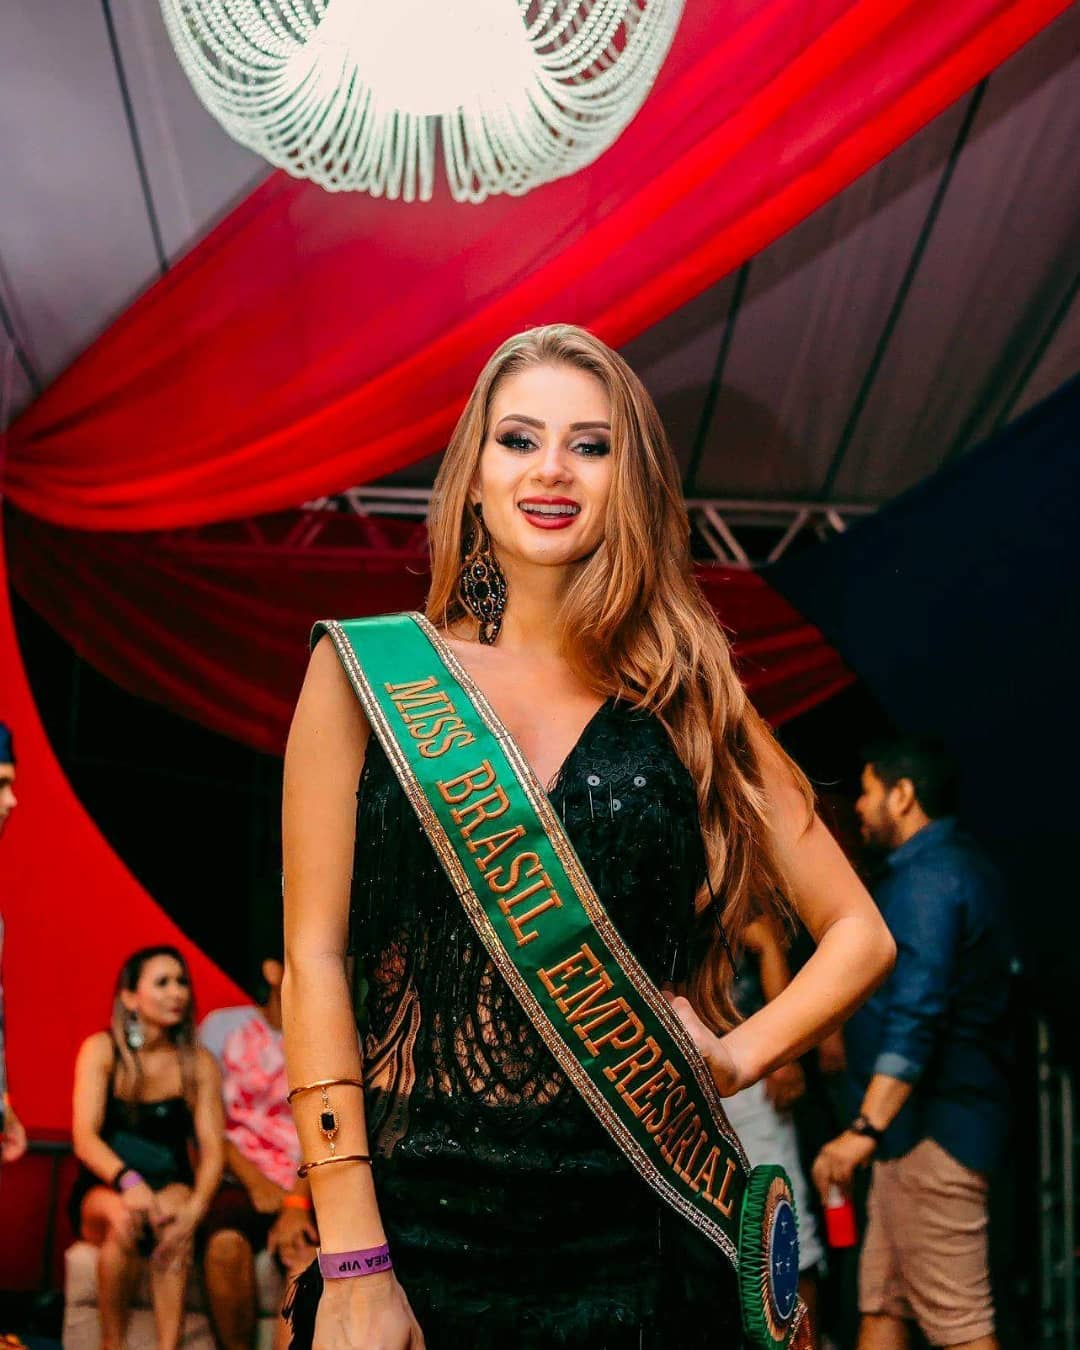 gabriela palma, miss brasil empresarial 2018. - Página 6 38643410